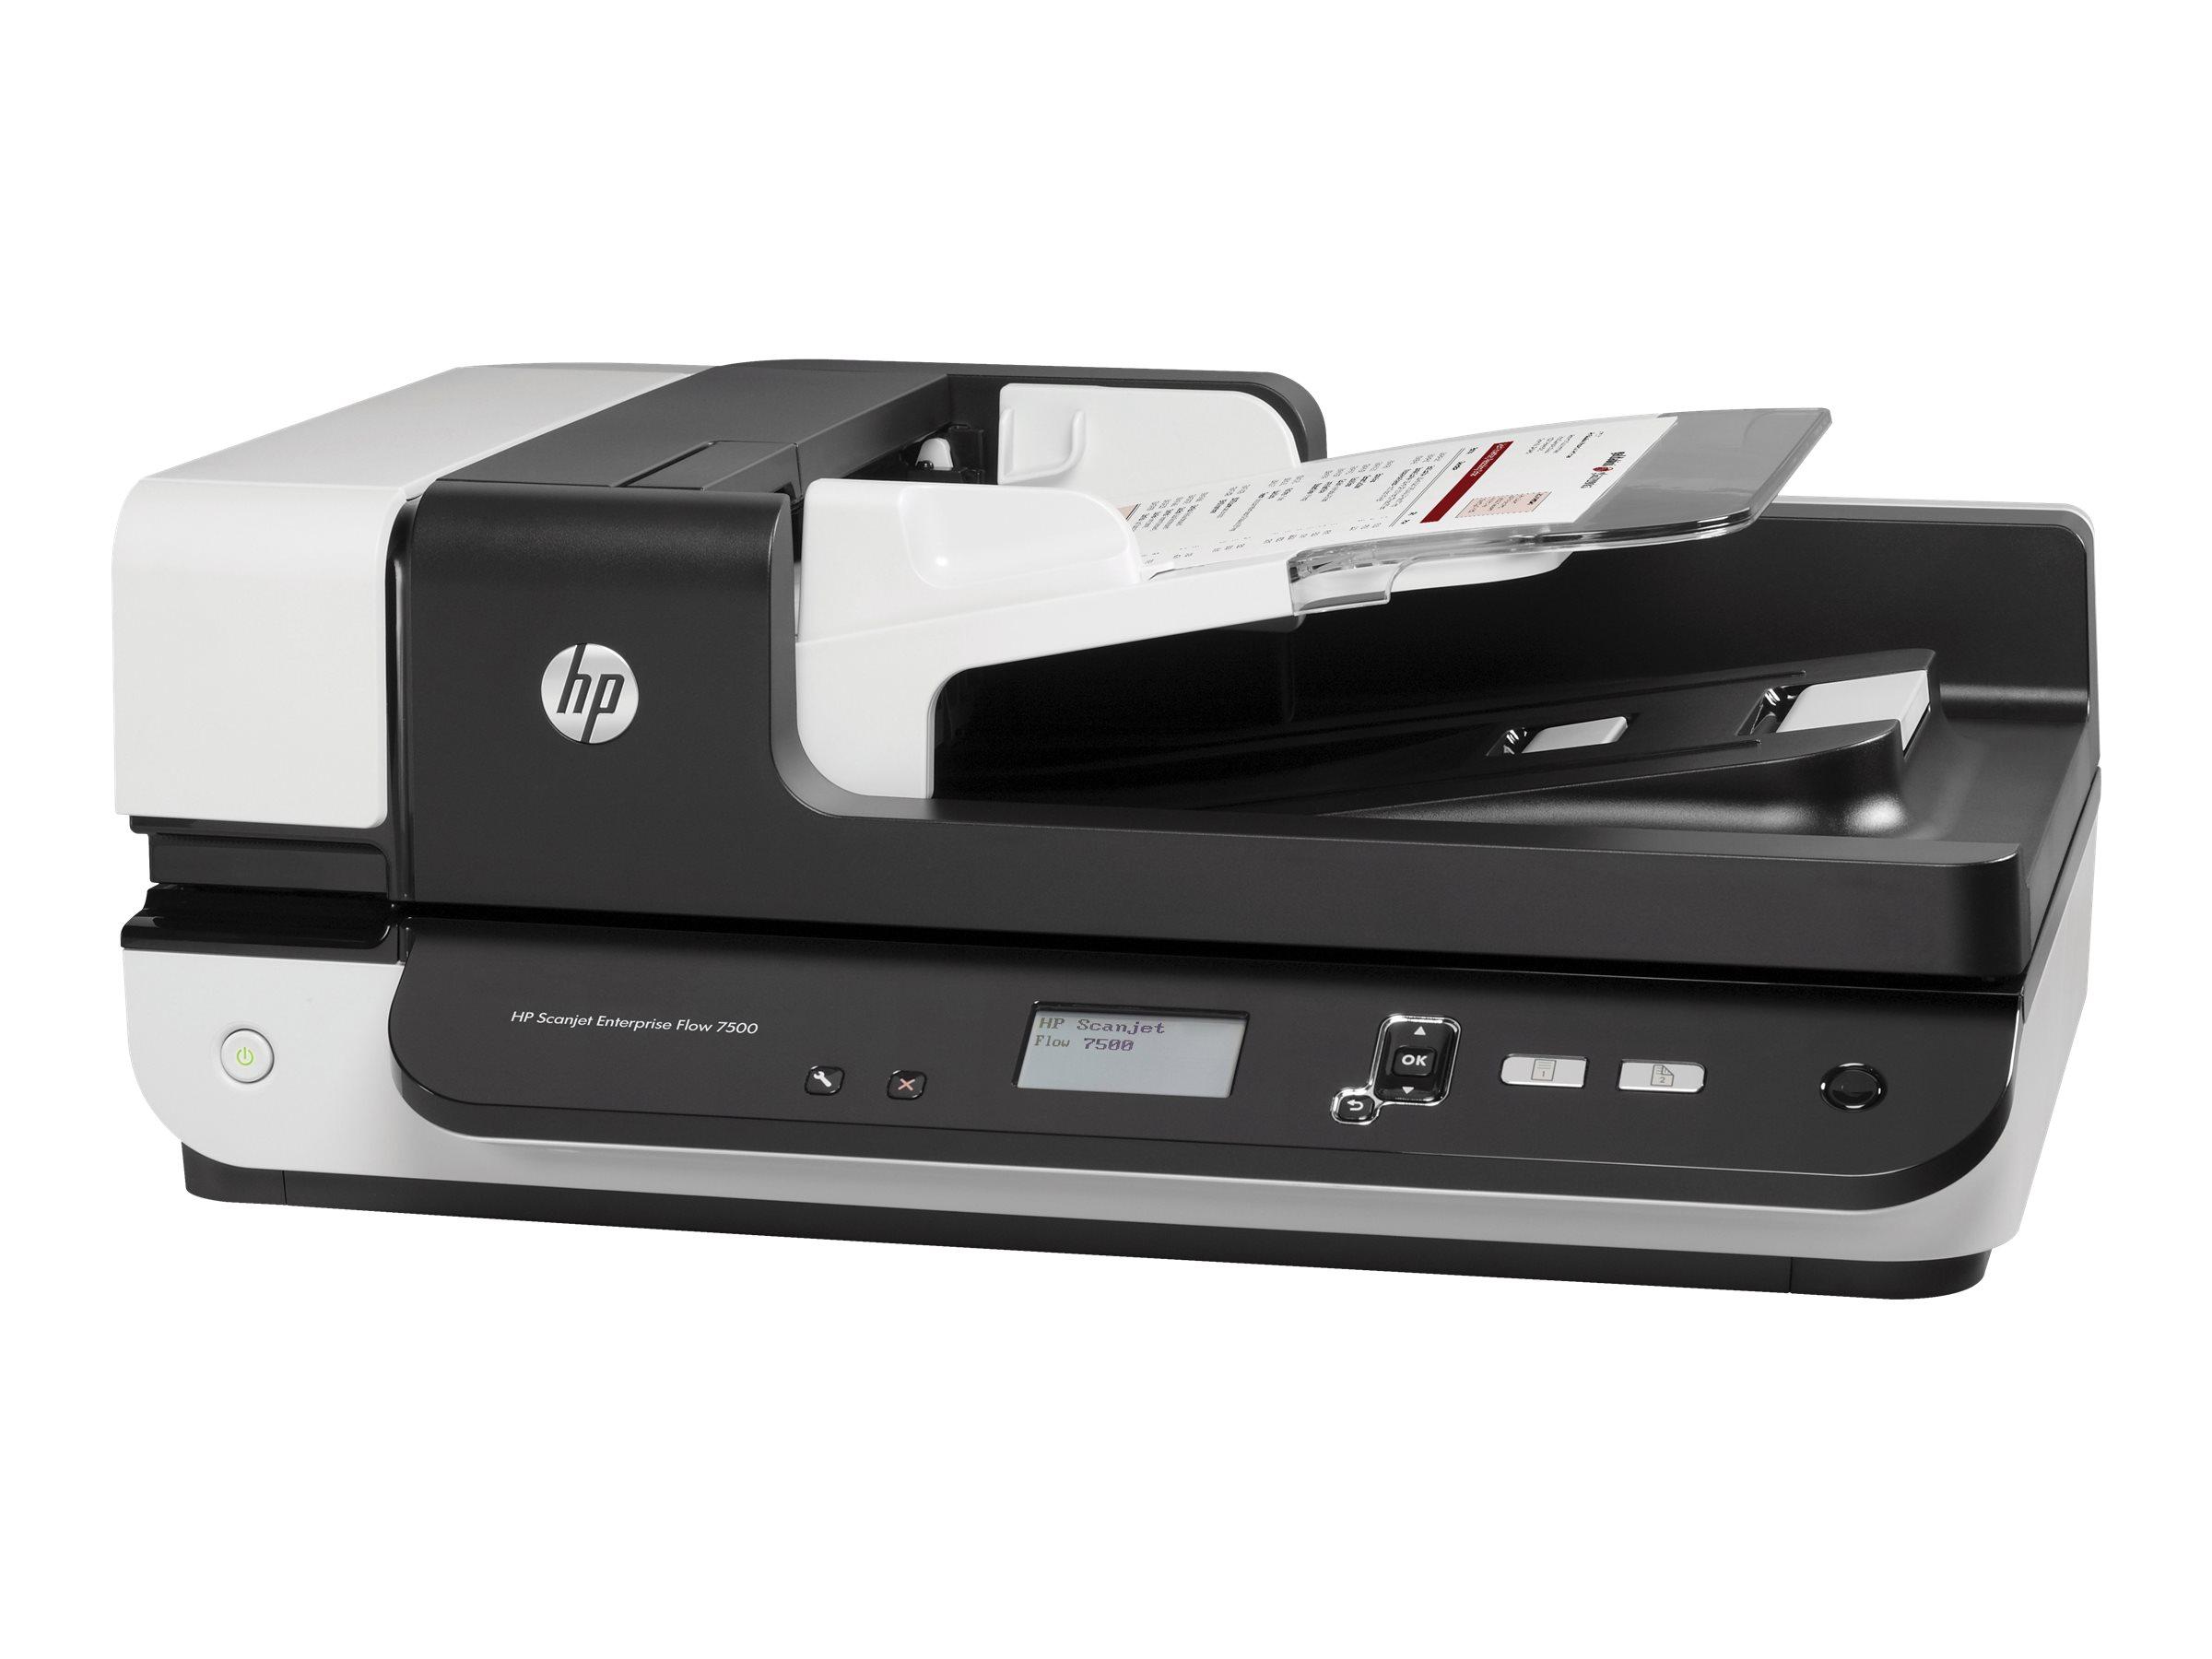 HP ScanJet Enterprise Flow 7500 - Dokumentenscanner - CCD - Duplex - 216 x 864 mm - 600 dpi x 600 dpi